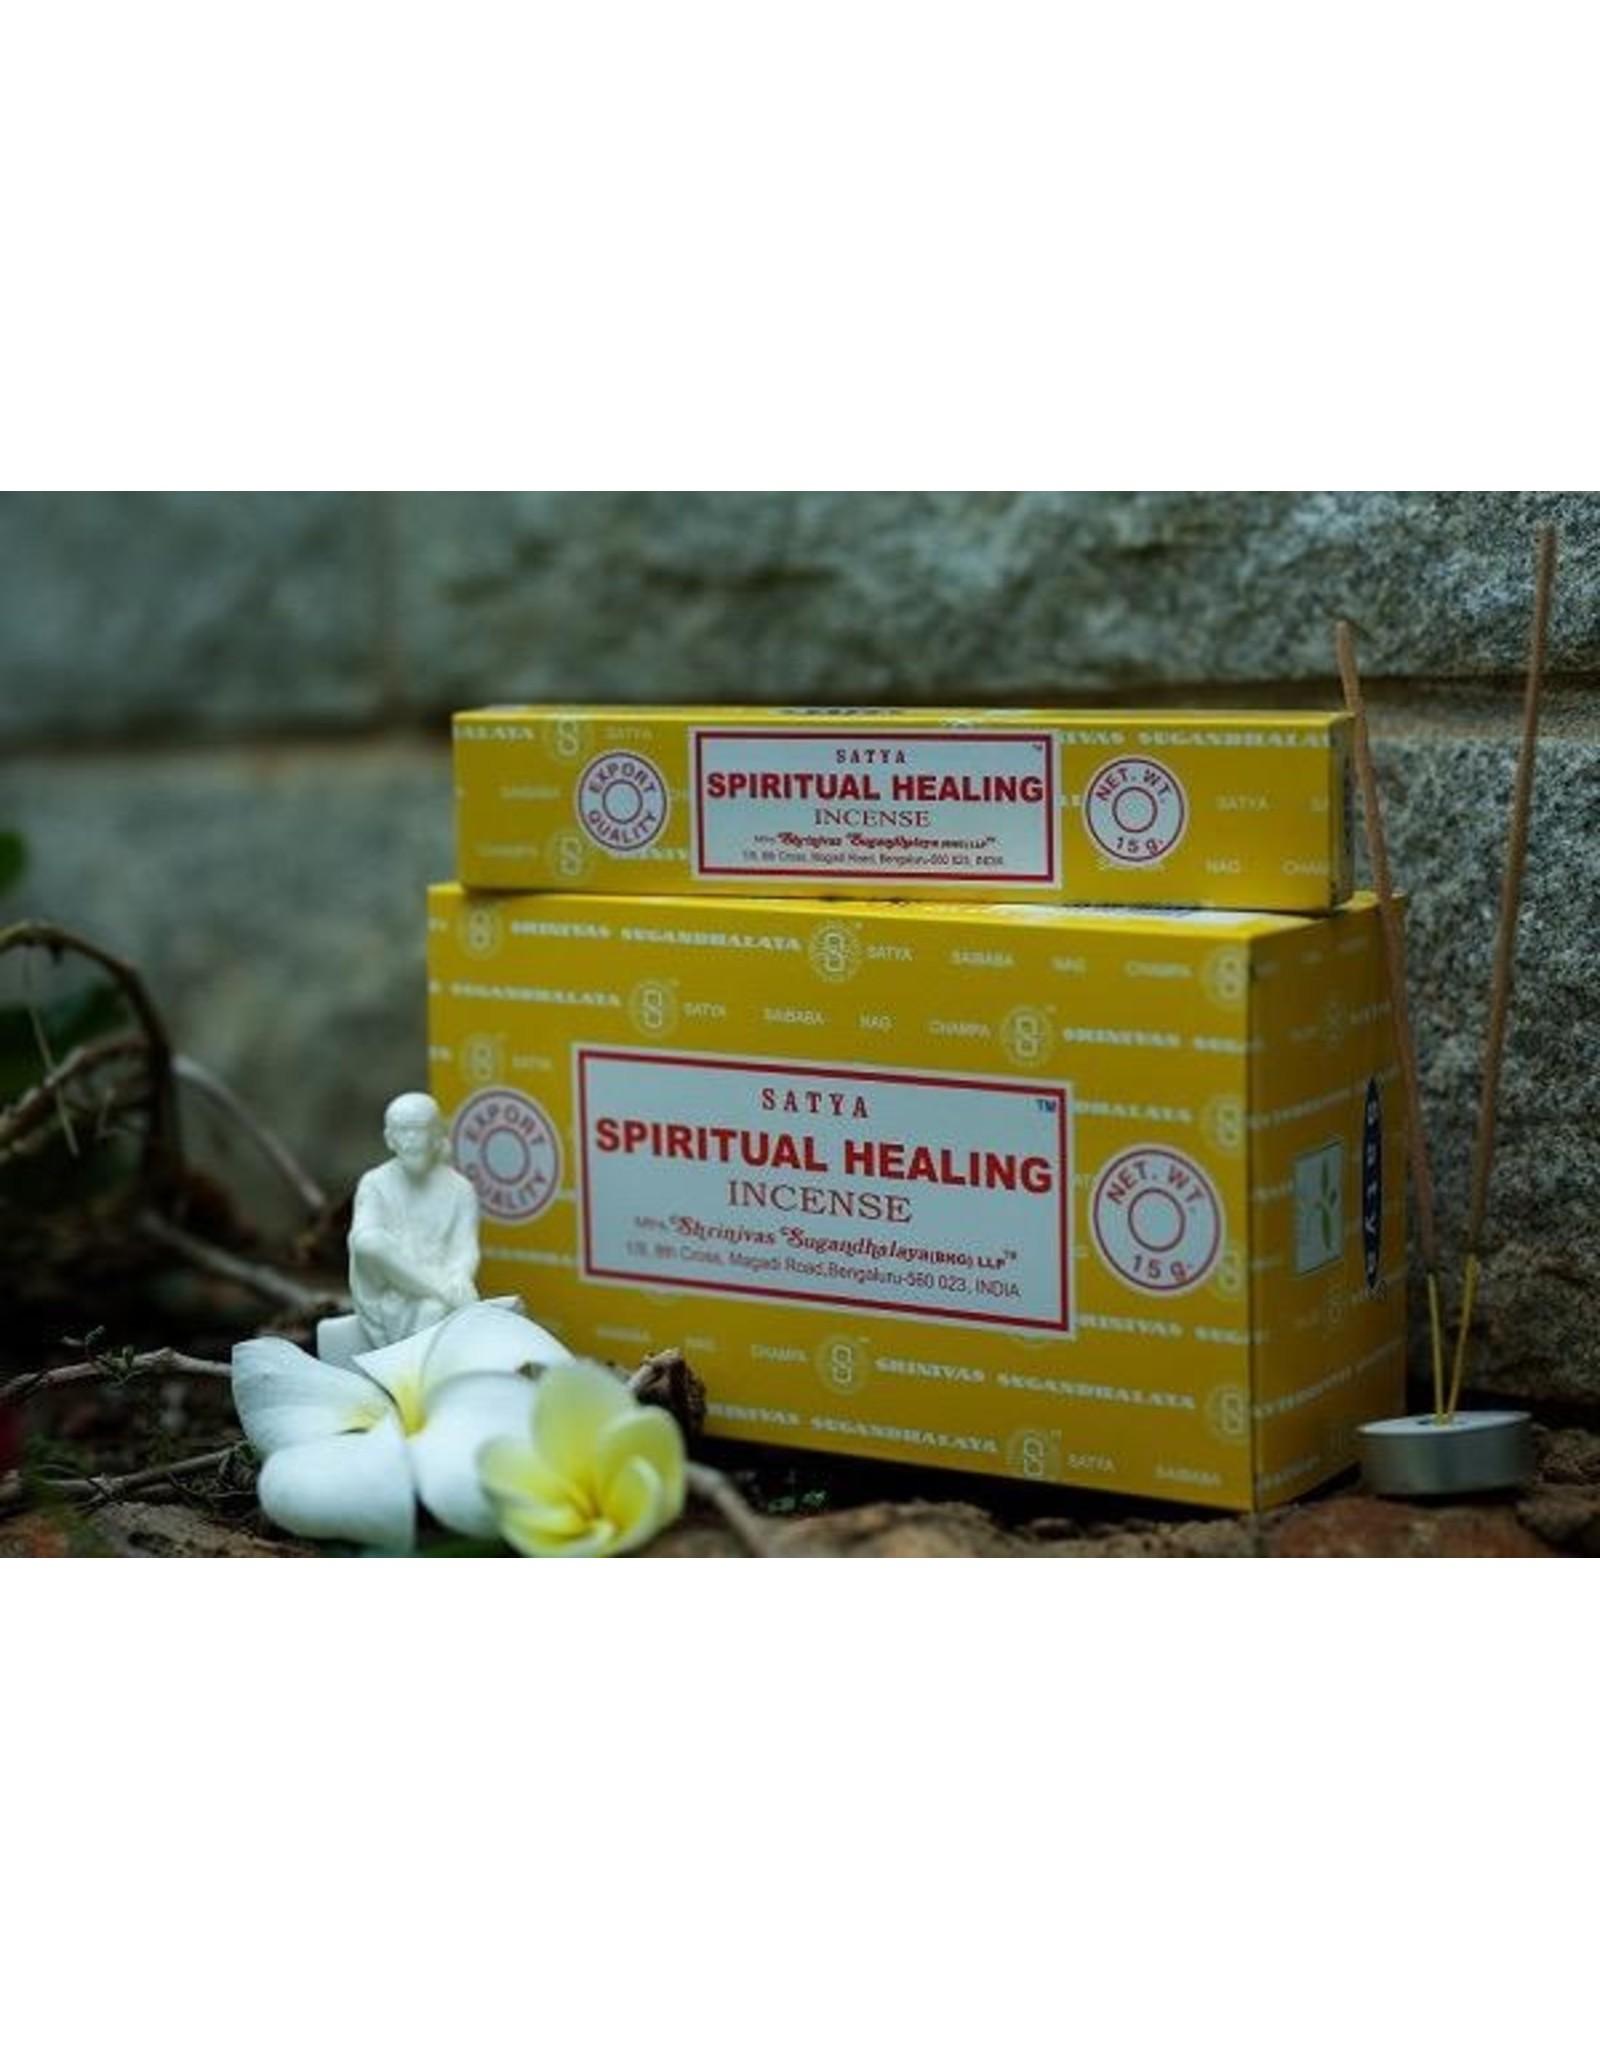 Satya Spiritual Healing 15 Gram Incense Stick